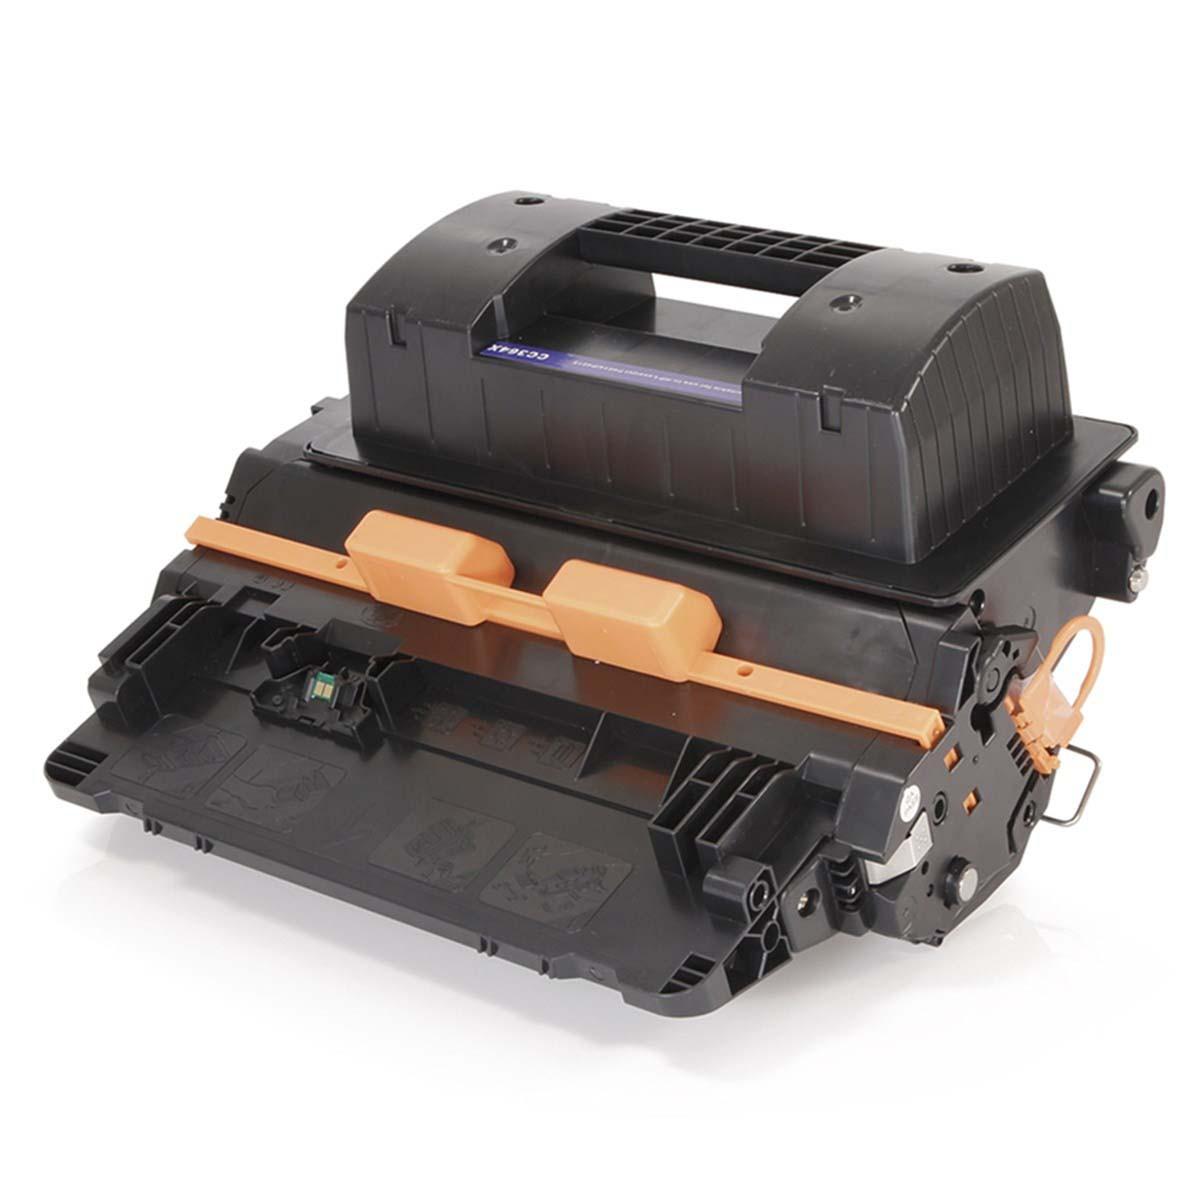 Toner Compativel com HP CC364X 364X - P4015 P4015N P4015DN P4515 P4515N - 20K